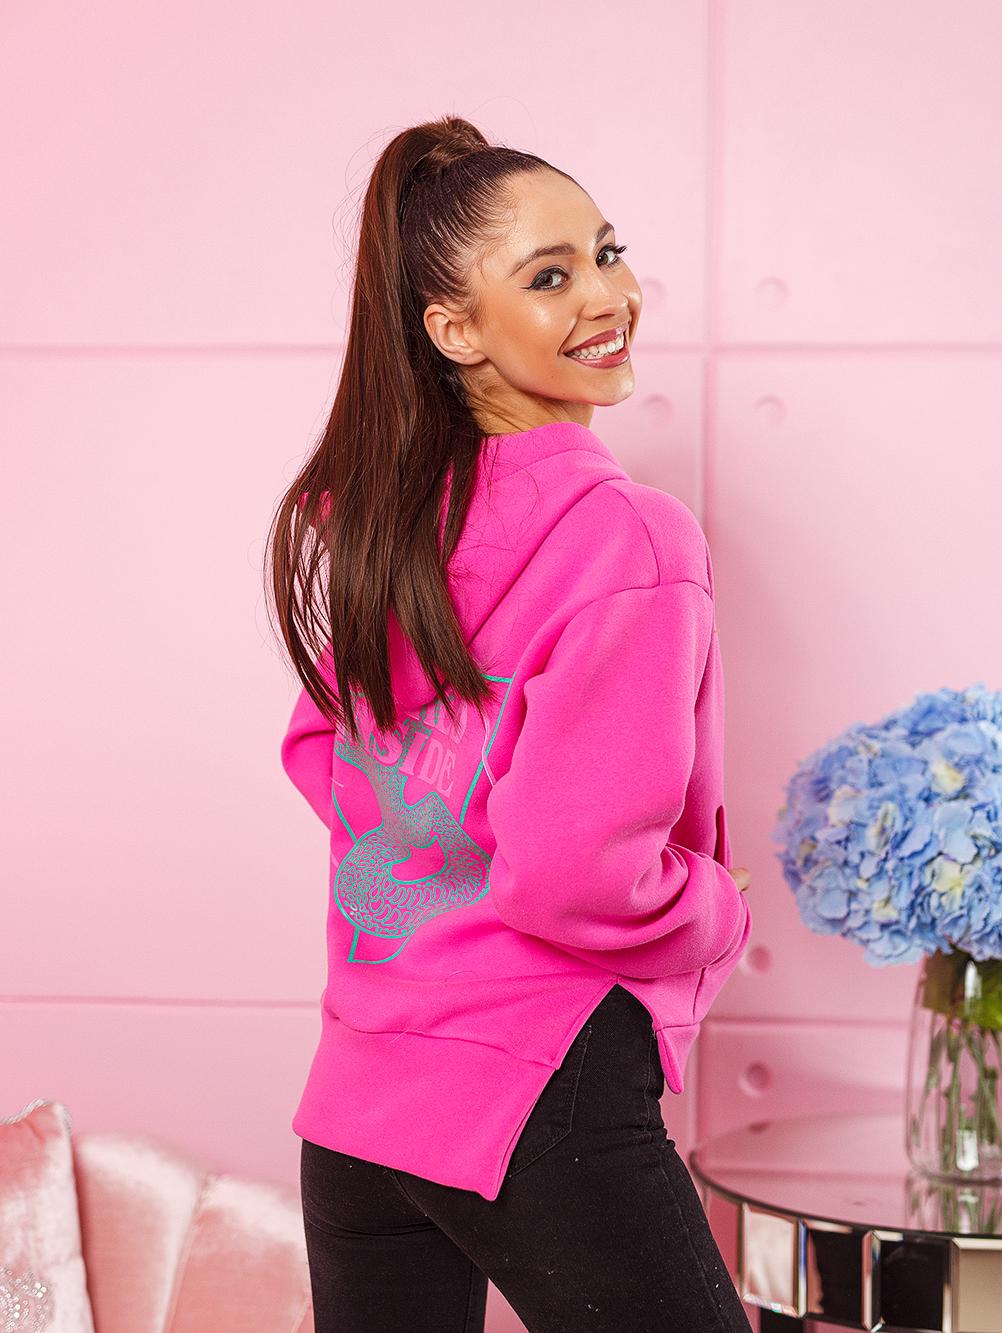 bluza damska bawelniana z zamkami po bokach nadruk na plecach i na piersi roz (3)